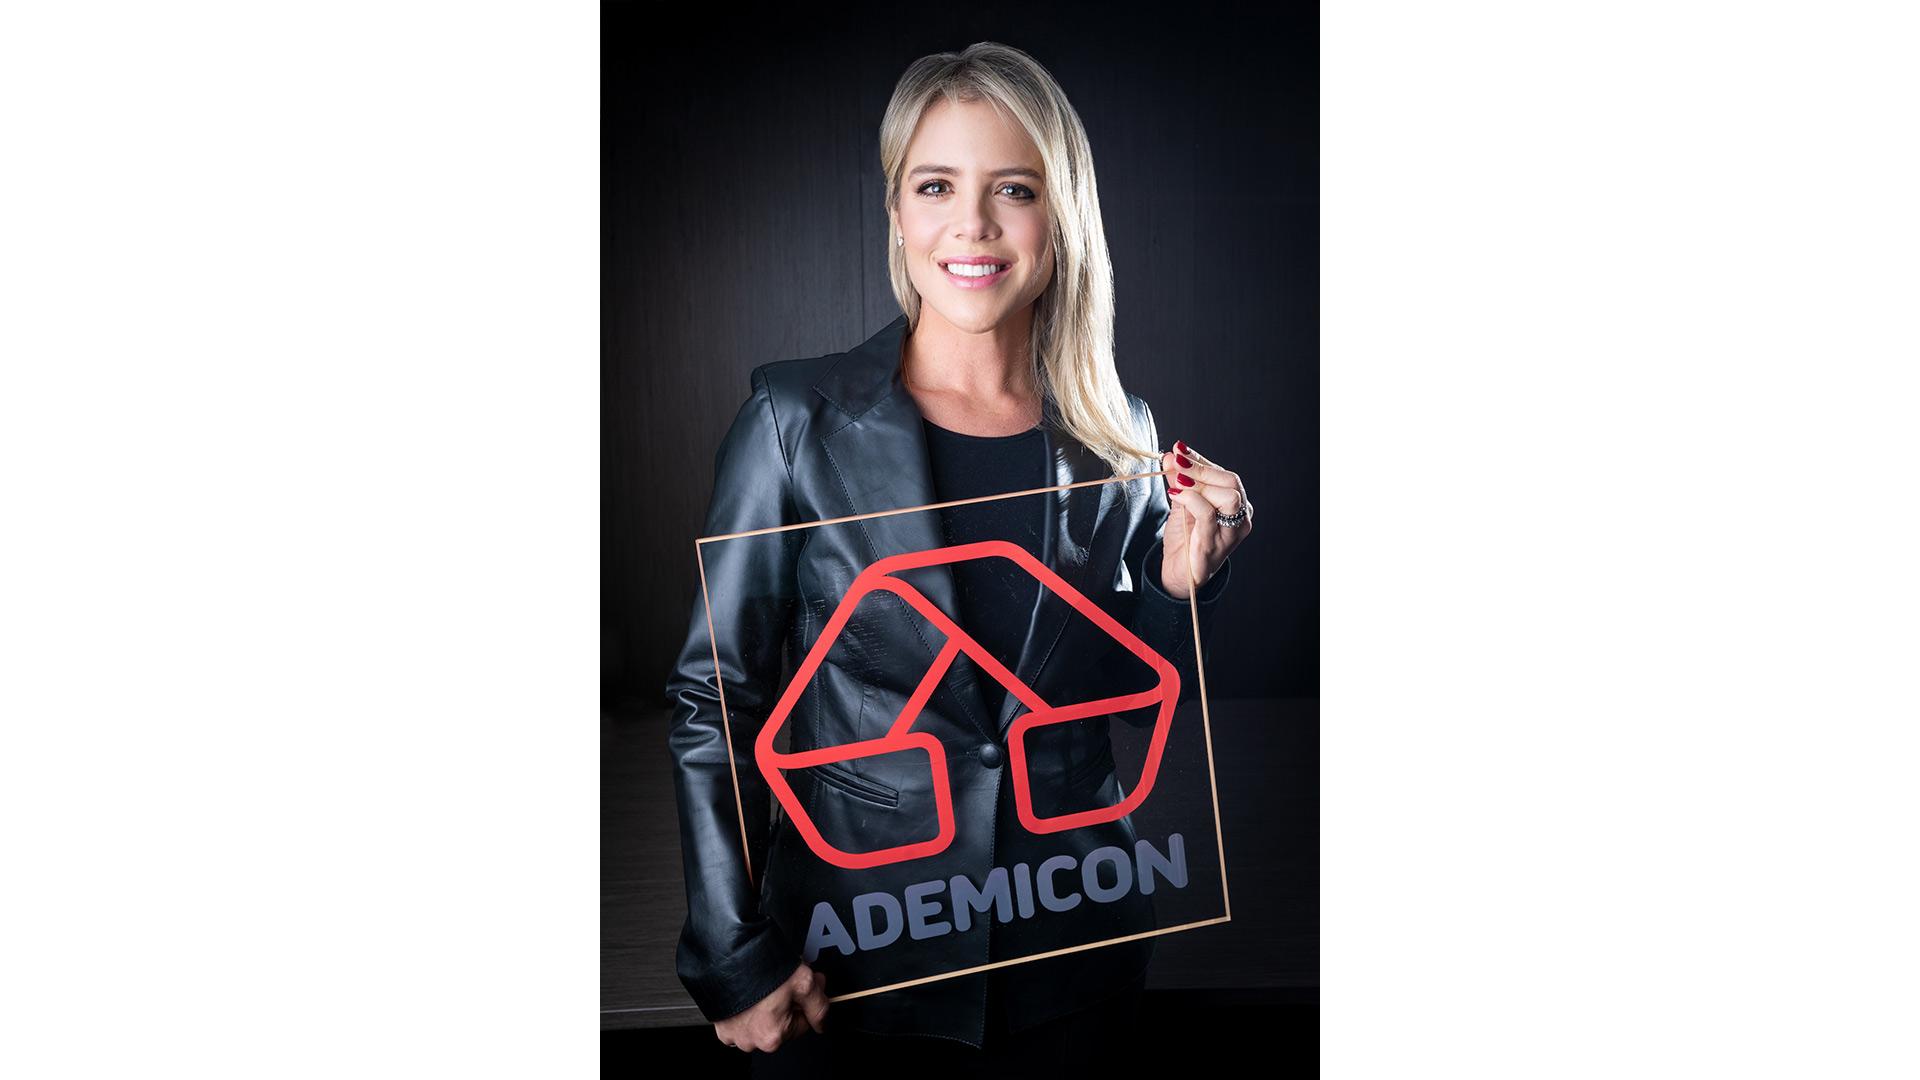 Tatiana Schuchovsky Reichmann é CEO do Grupo Ademicon. A empresa é a maior administradora independente de consórcios do Brasil, no segmento de imóveis e pesados.